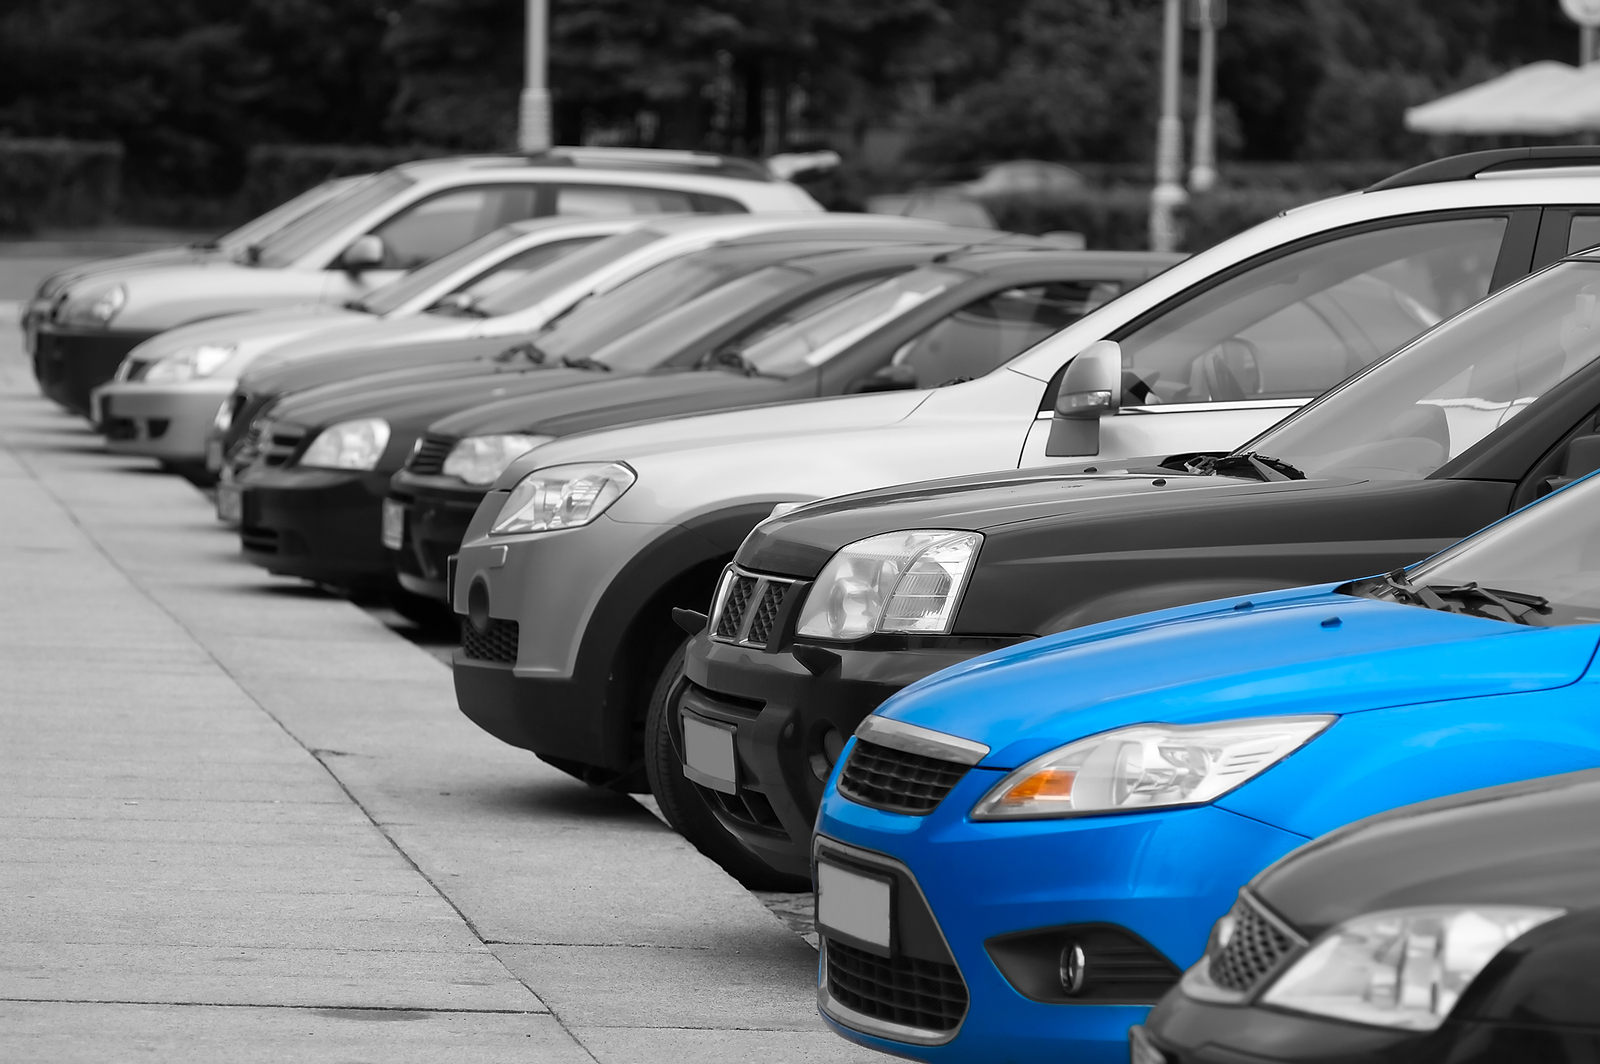 Gu a para comprar y asegurar tu coche de segunda mano for Coches de segunda mano